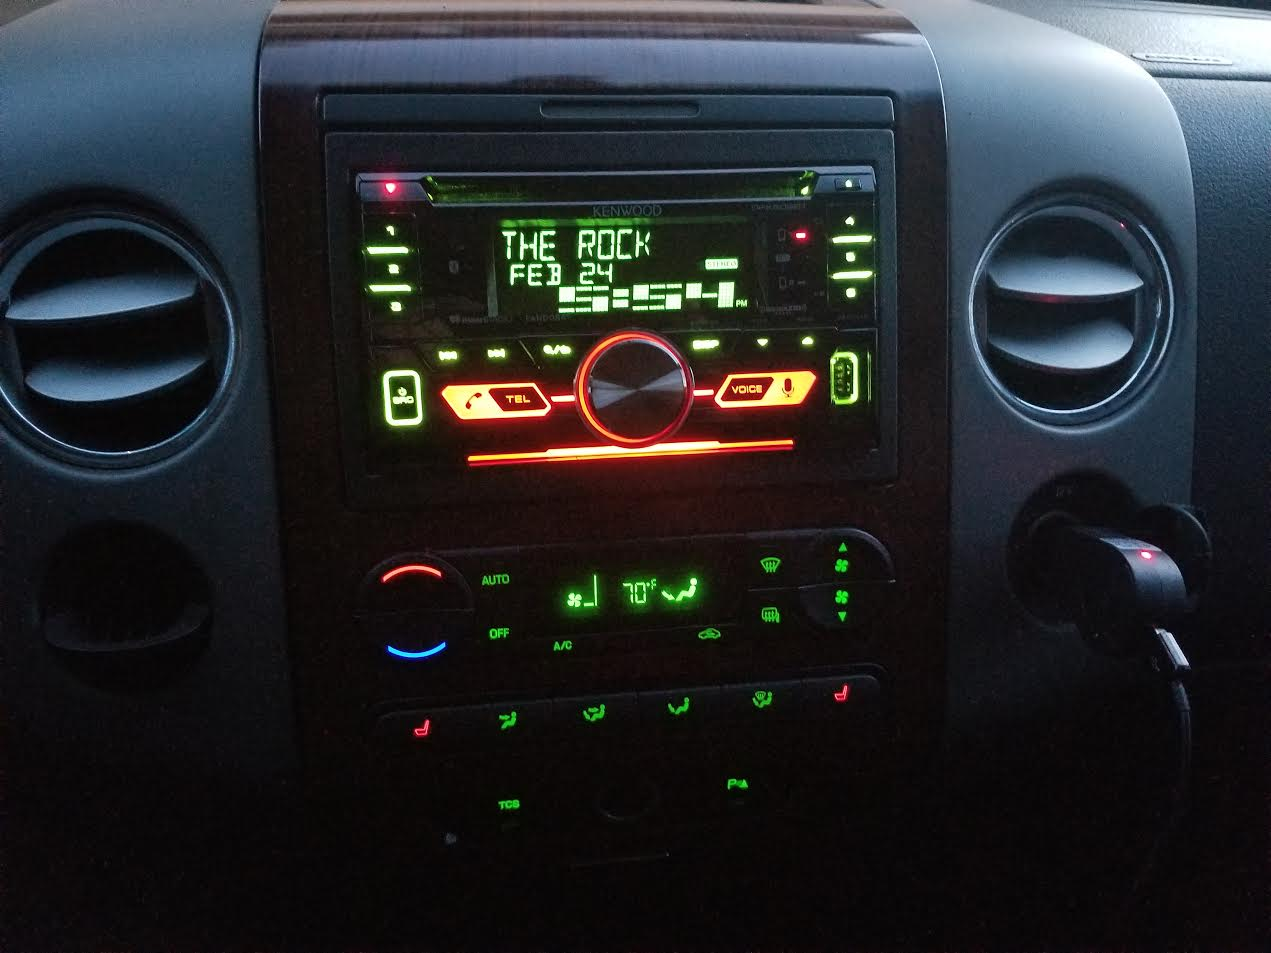 Kenwood DPX502BT CD receiver at Crutchfield